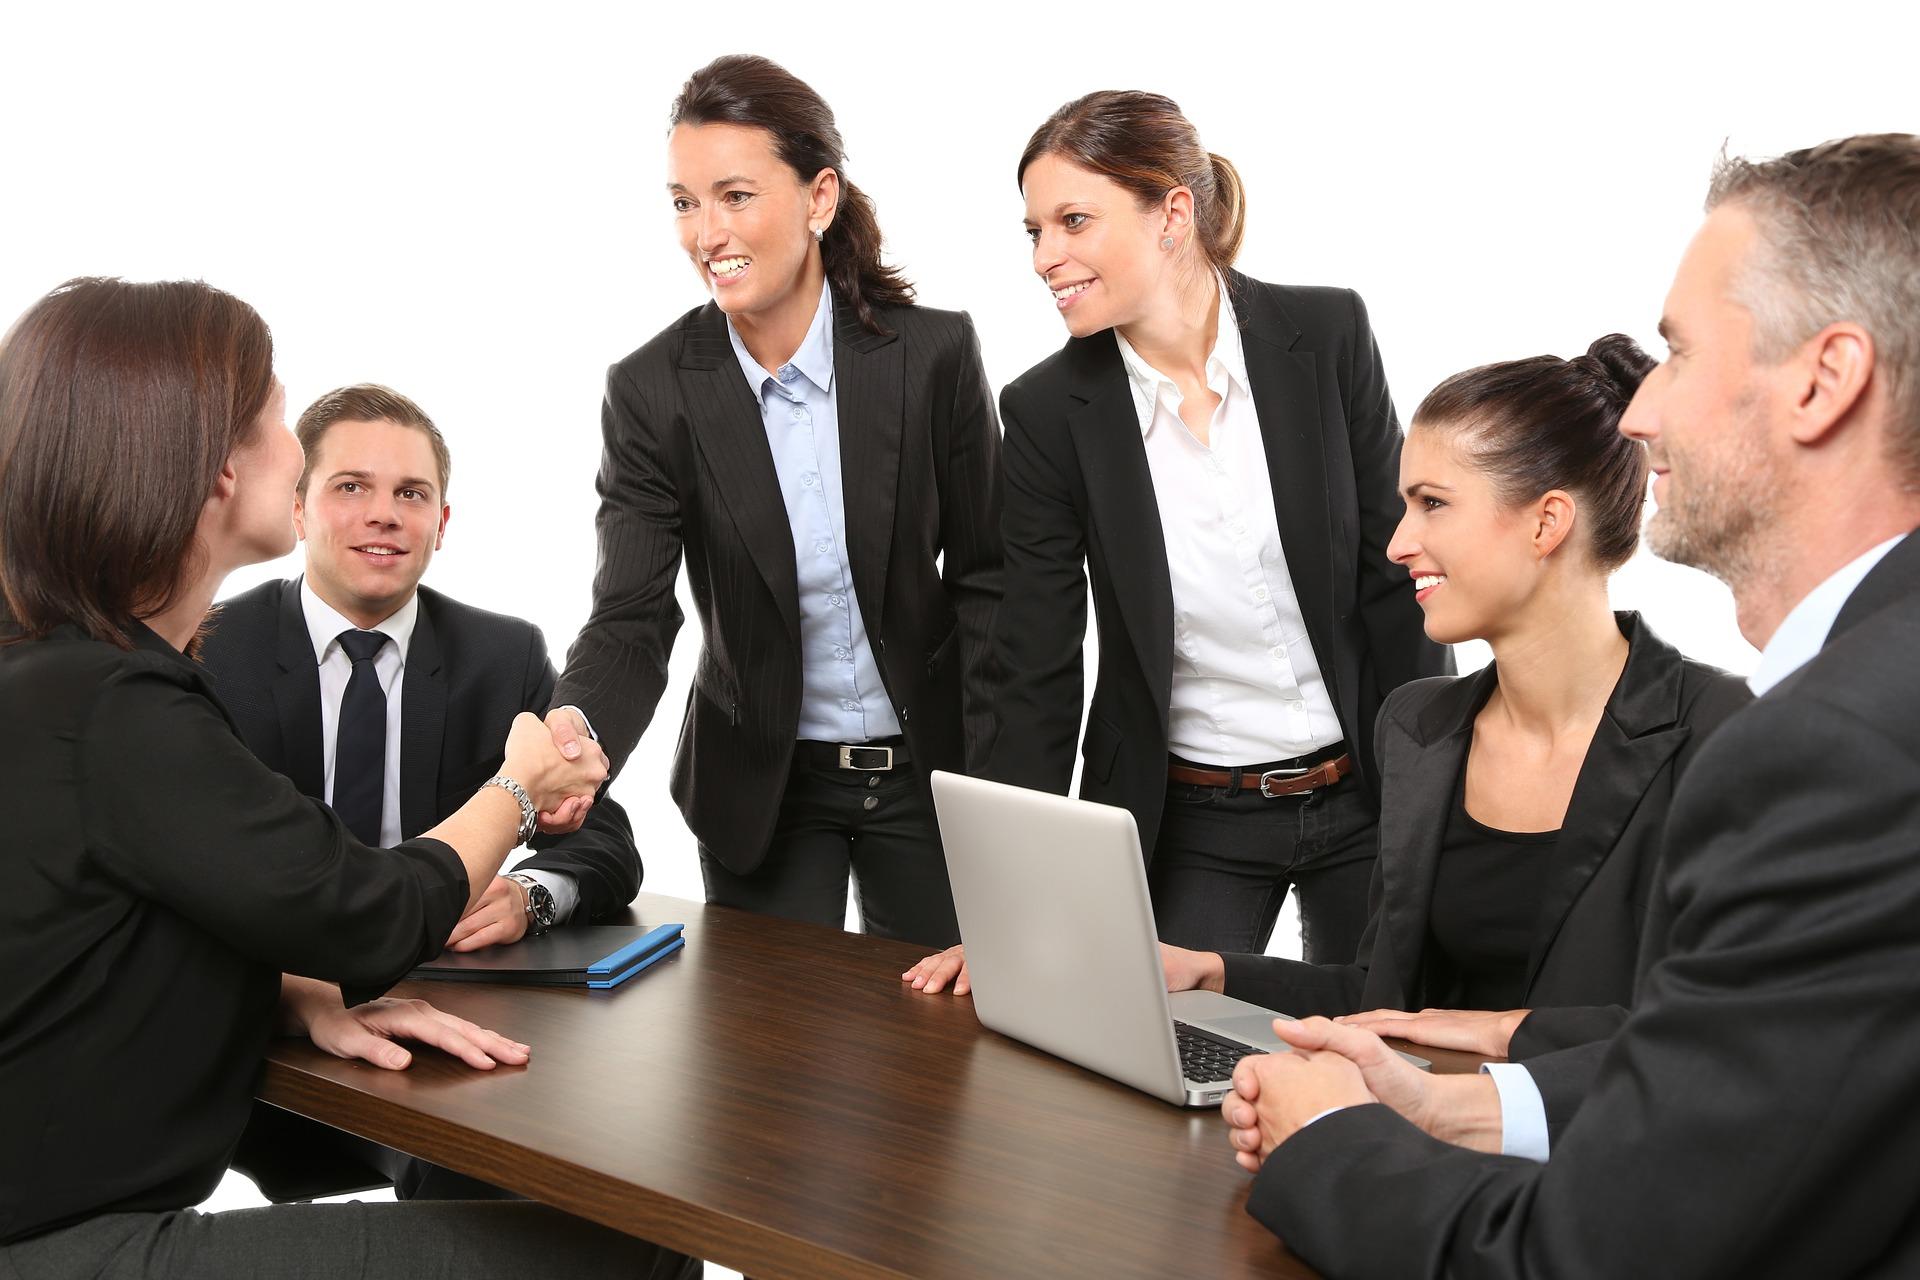 Drive negotiation training